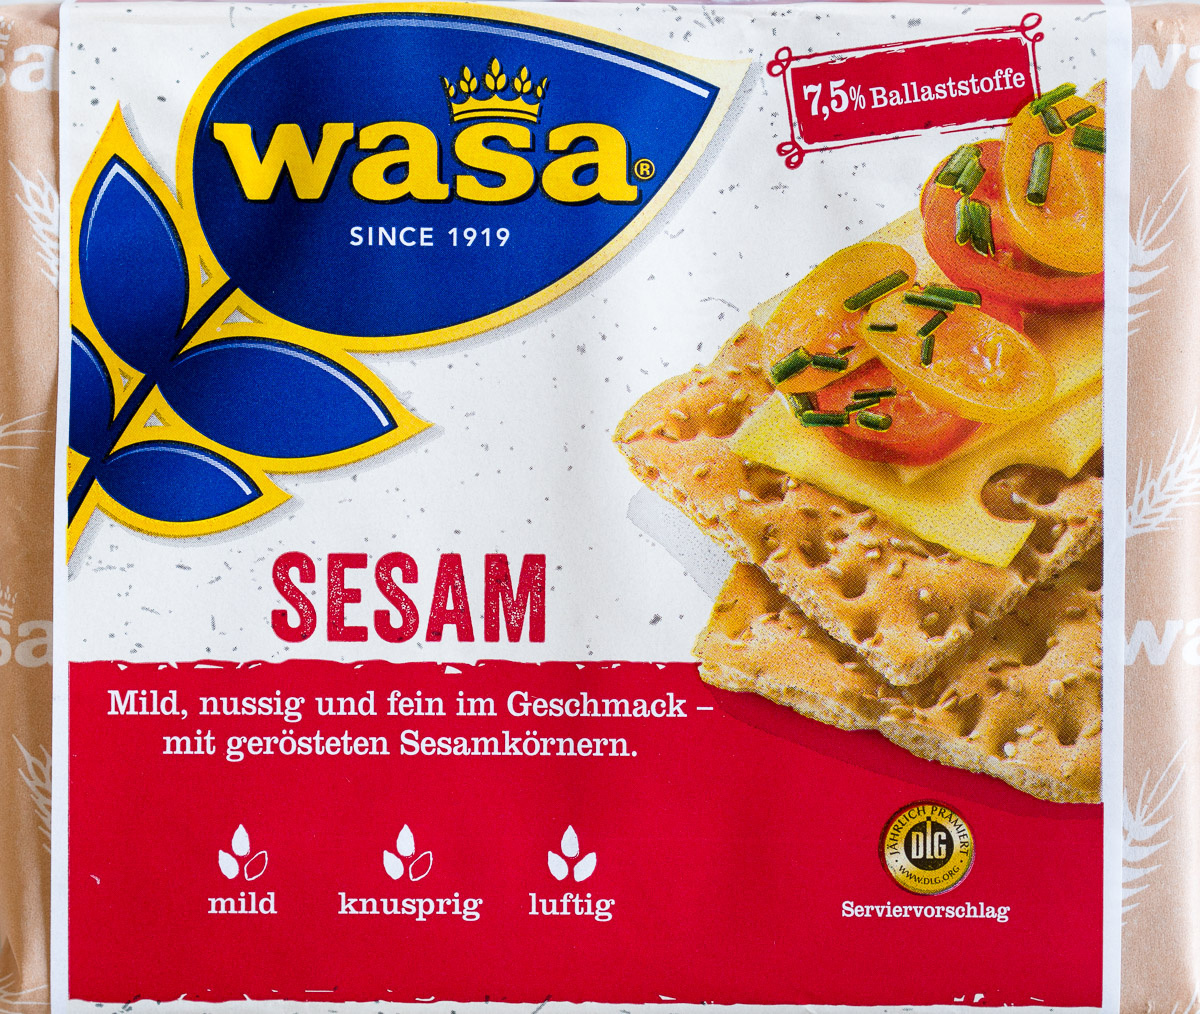 Biscotes integrales con sésamo tostado - Product - de